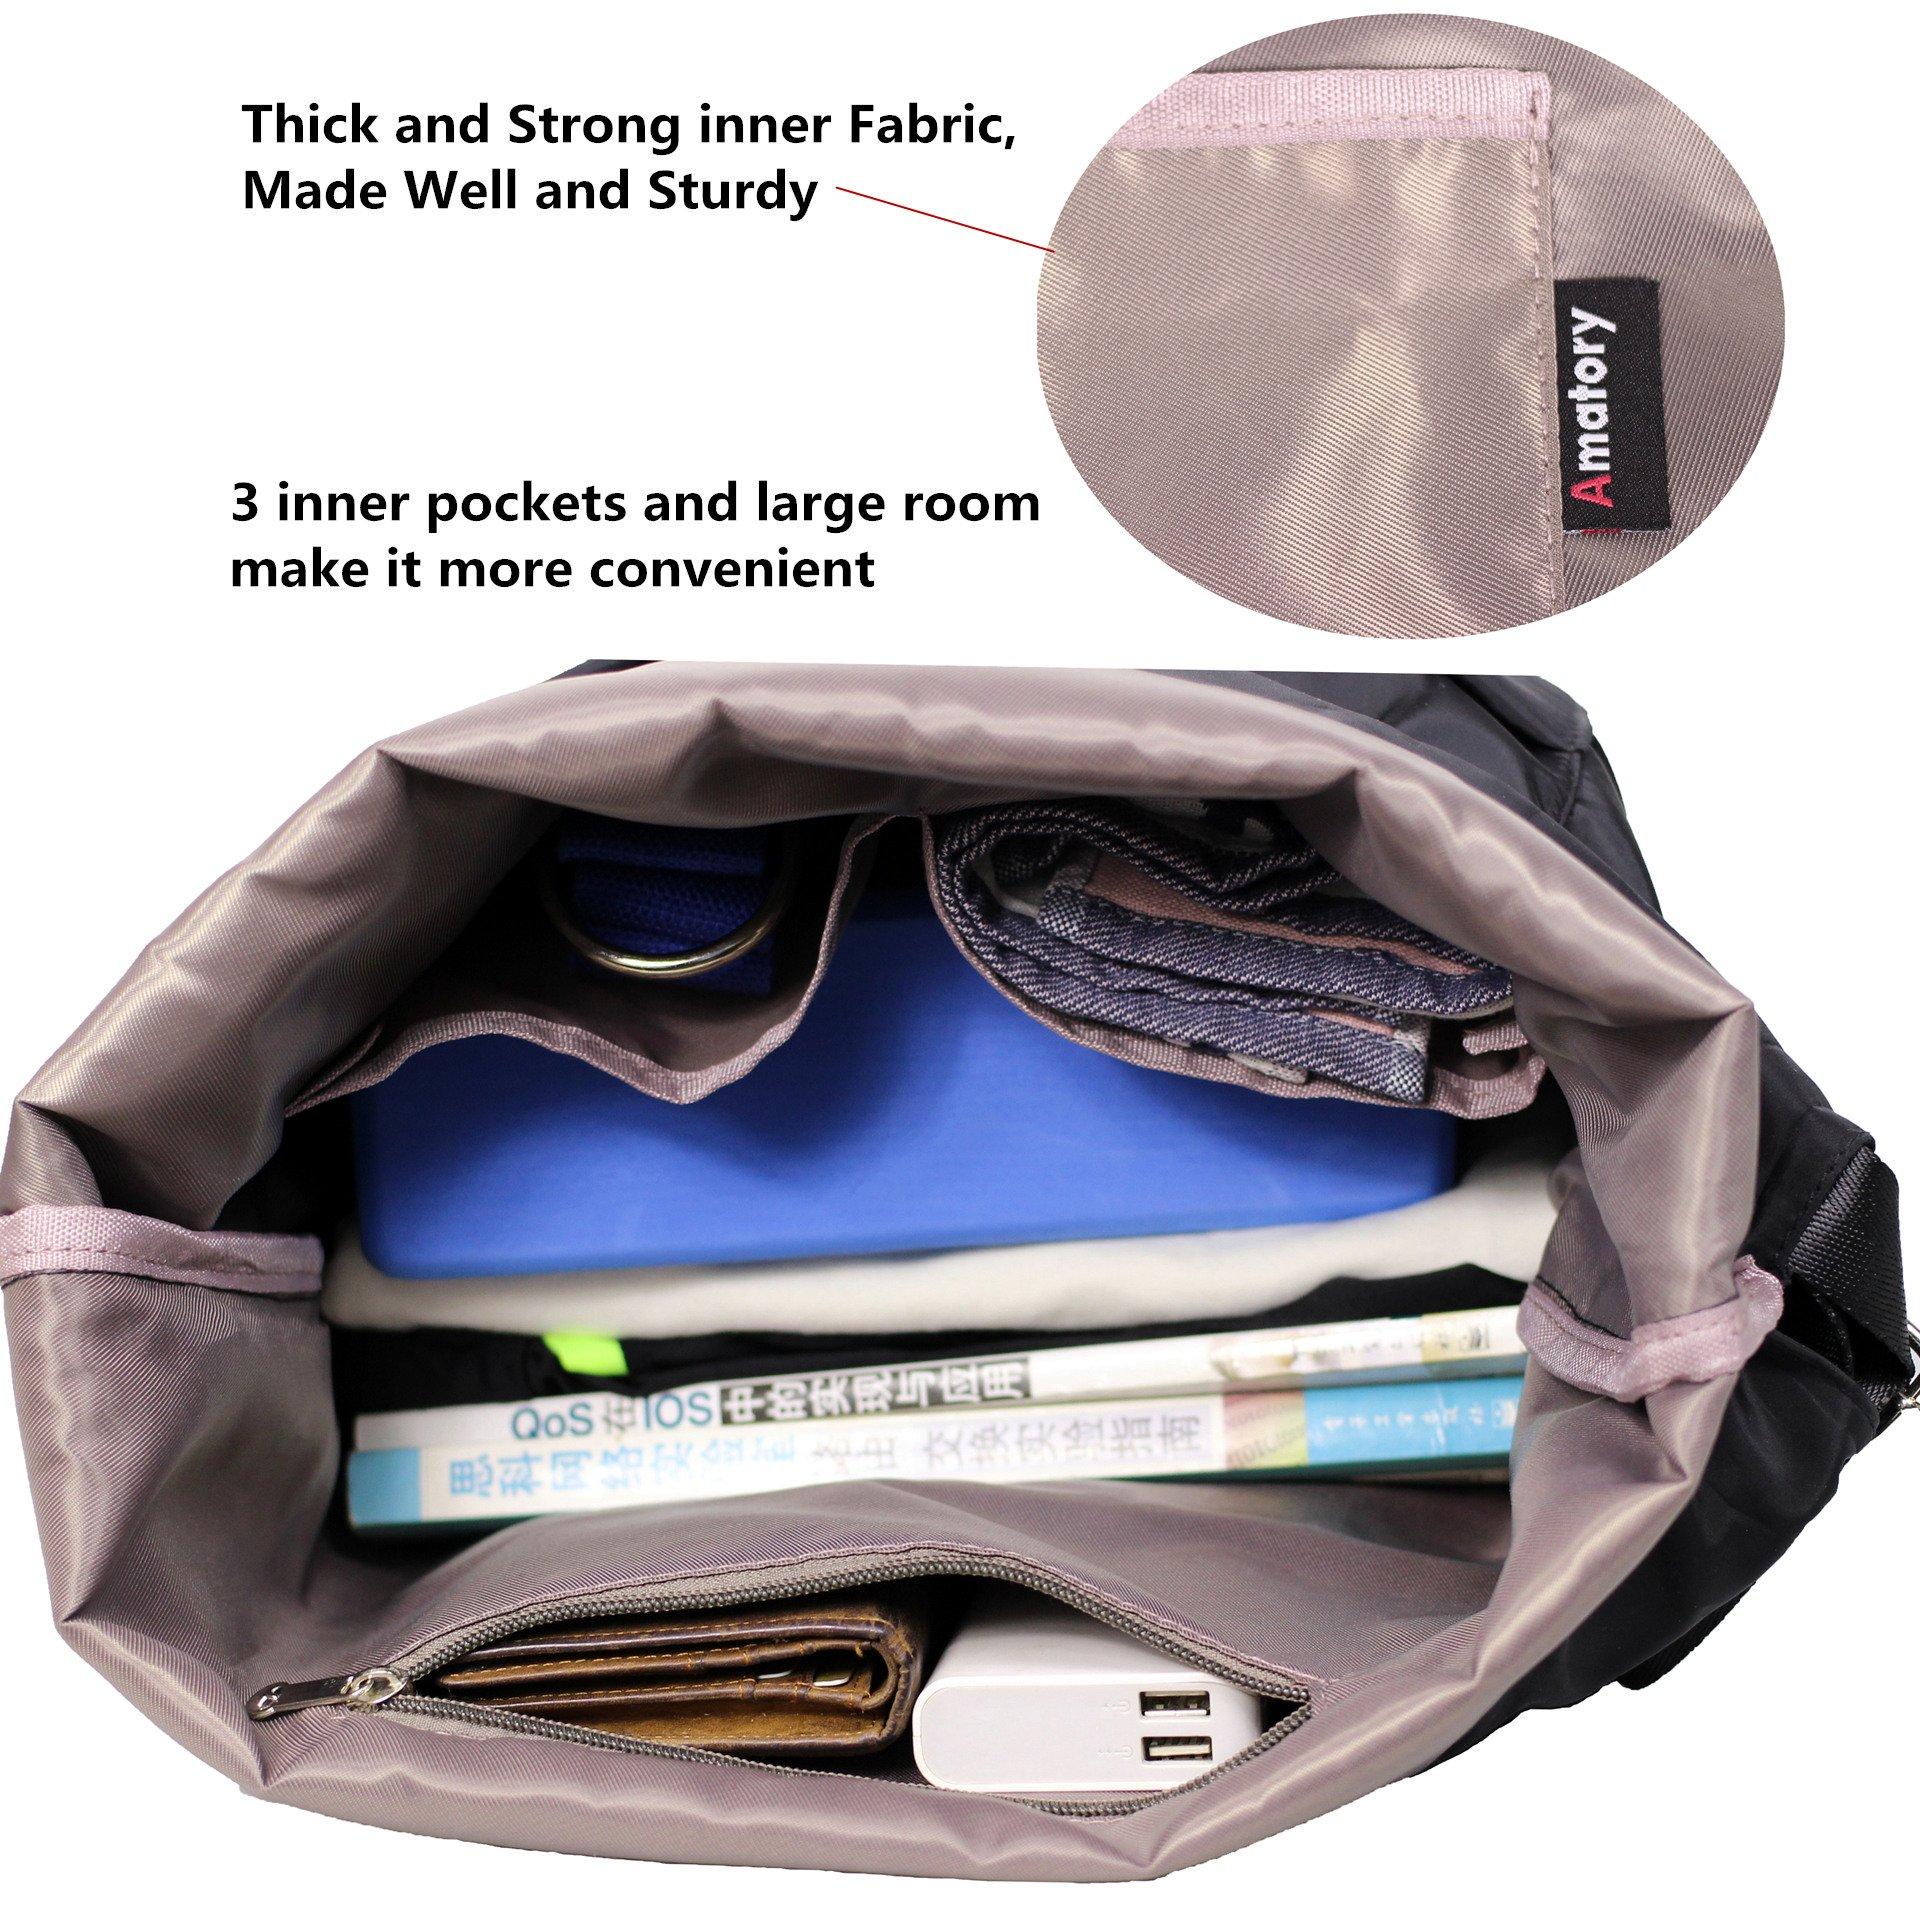 b4bd50dd5be7 Drawstring Backpack String Bag Sports Waterproof Sackpack Gymsack Gym Cinch  Sack (Large-Black) - Gym-Bag-009-Black   Drawstring Bags   Clothing